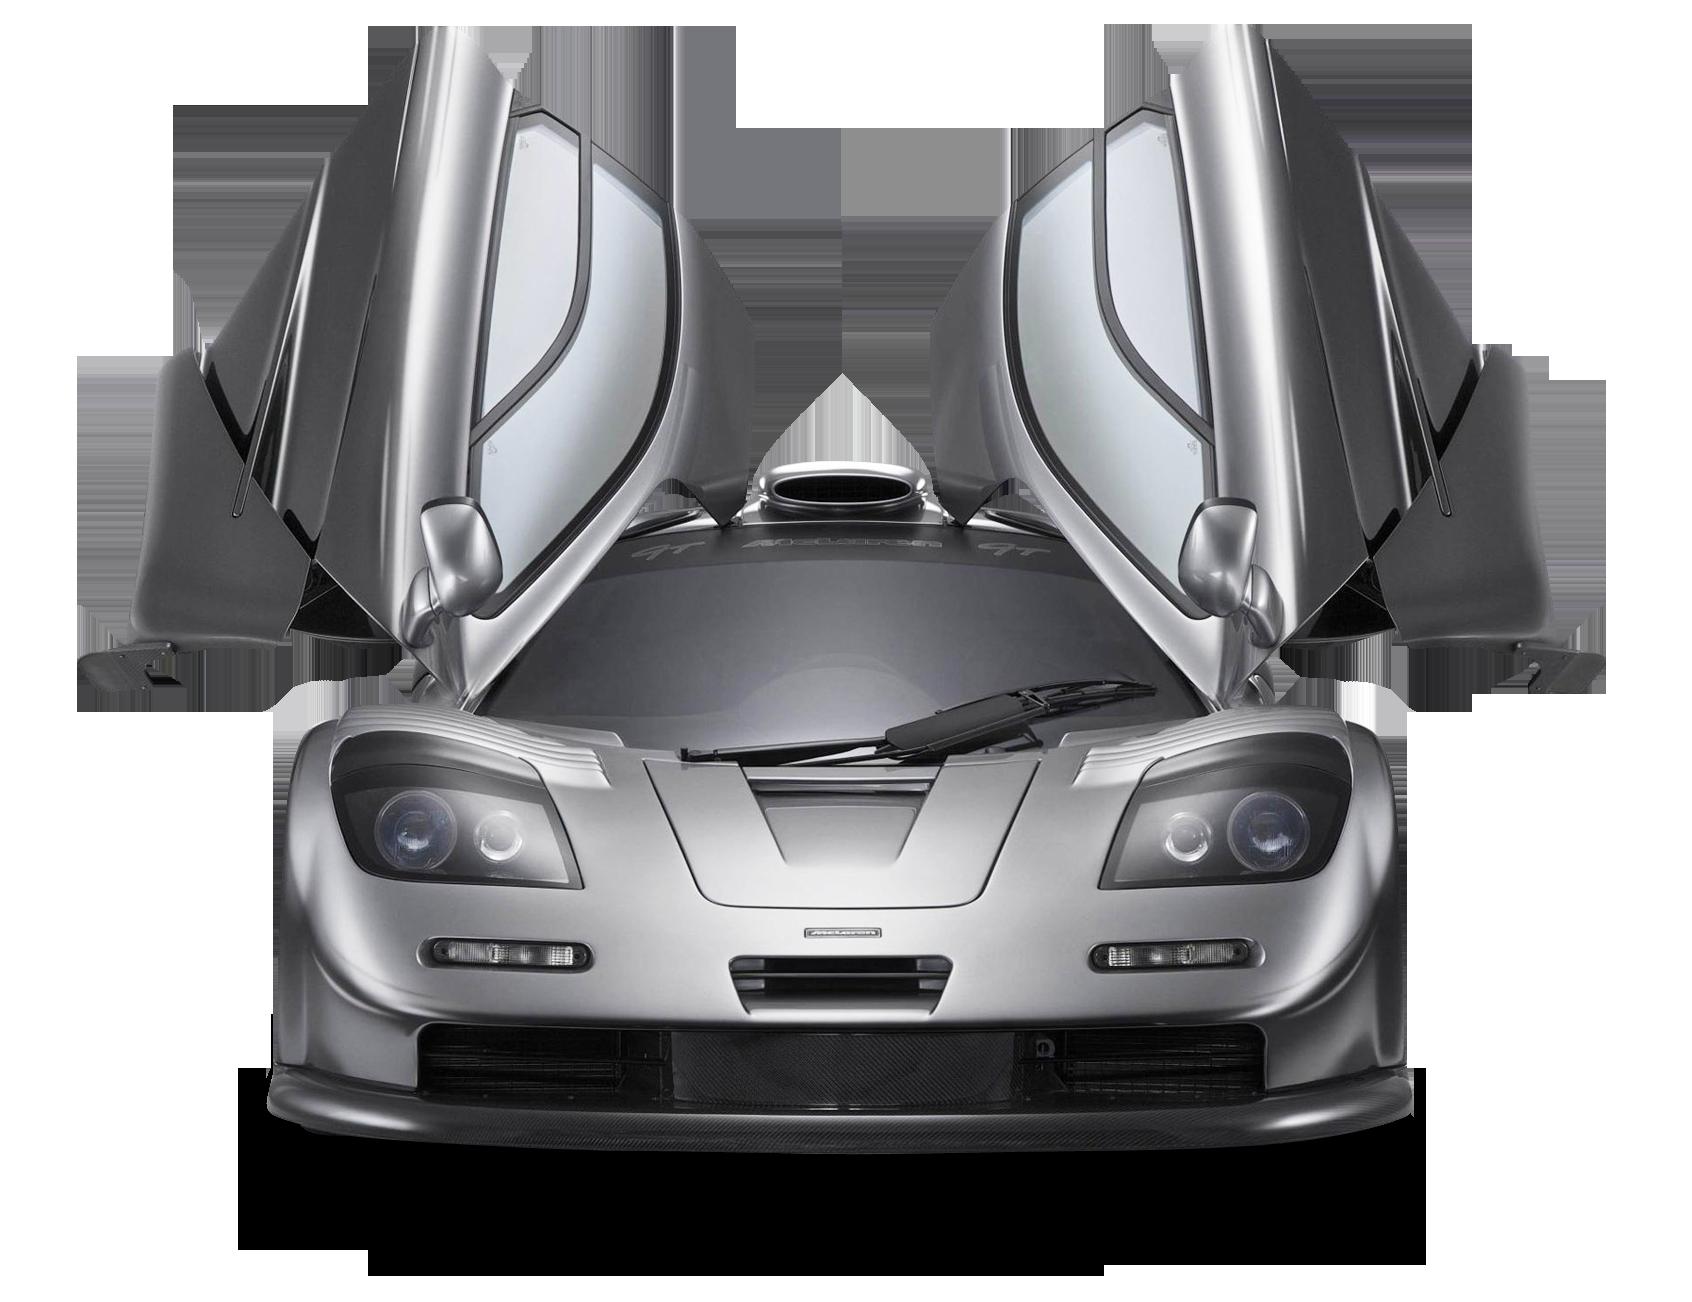 Gray 1997 McLaren F1 GT Car PNG Image